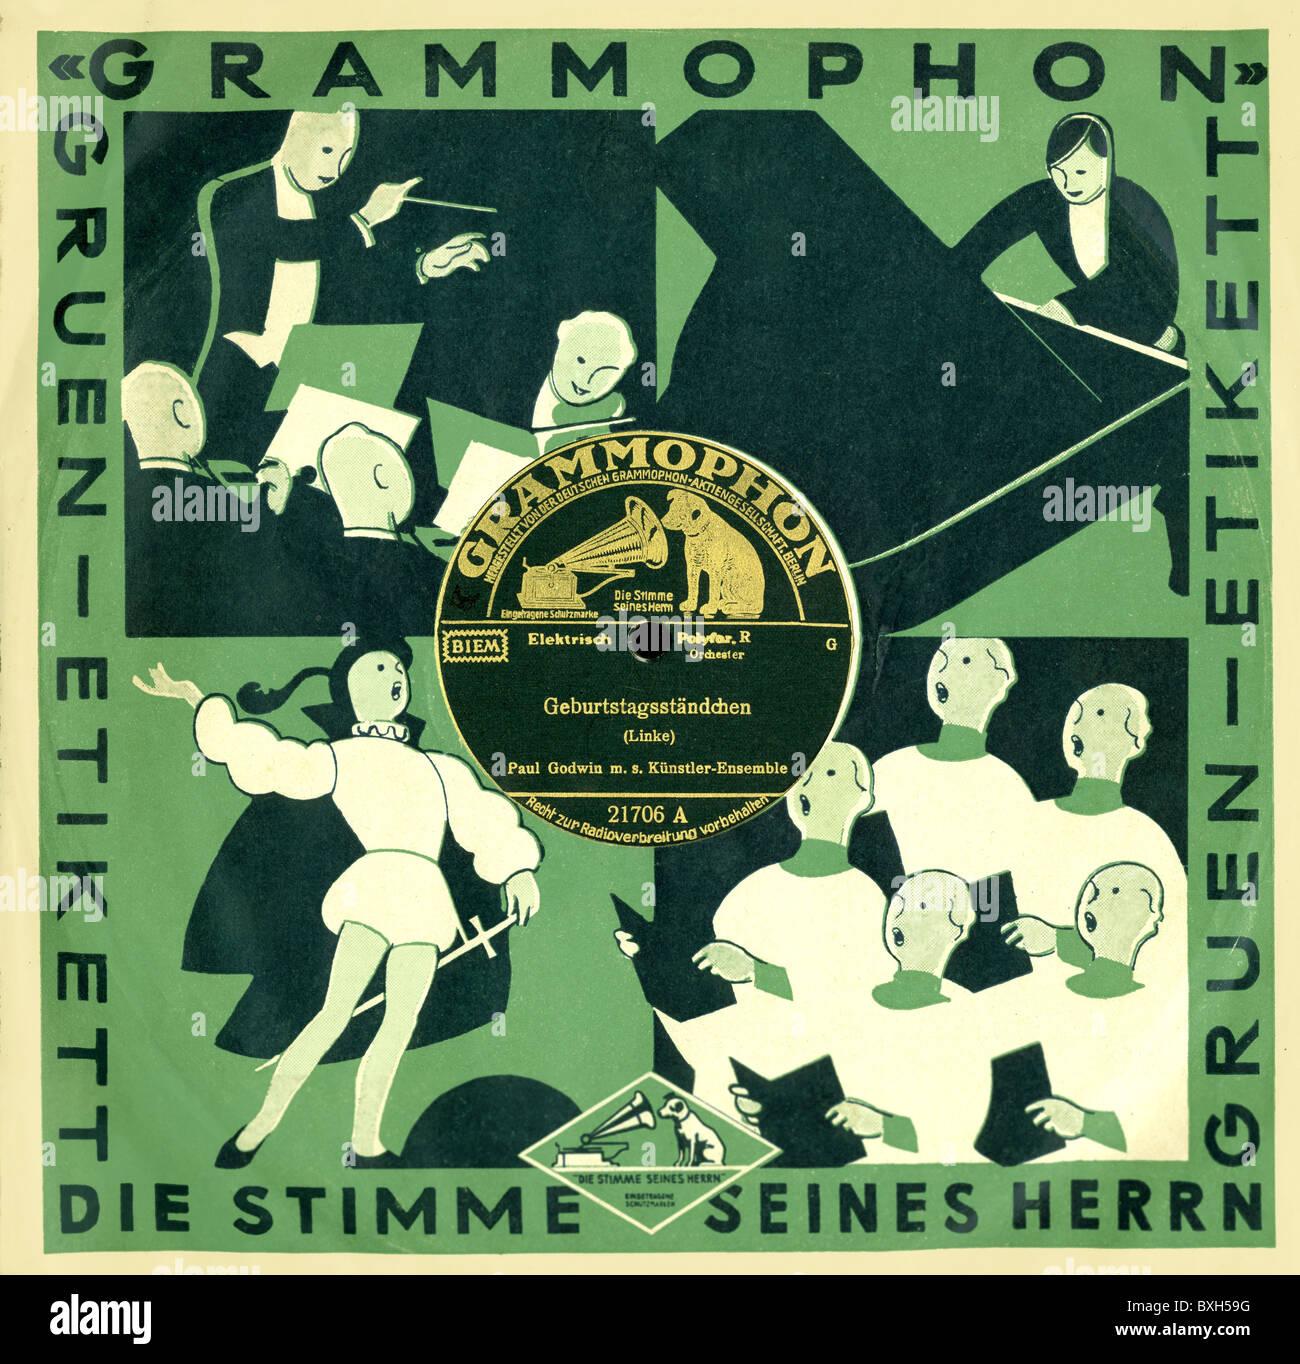 music, records, Grammophon, birthday serenades, by Paul Lincke, Deutsche Grammophon Aktien-Gesellschaft, Berlin, - Stock Image